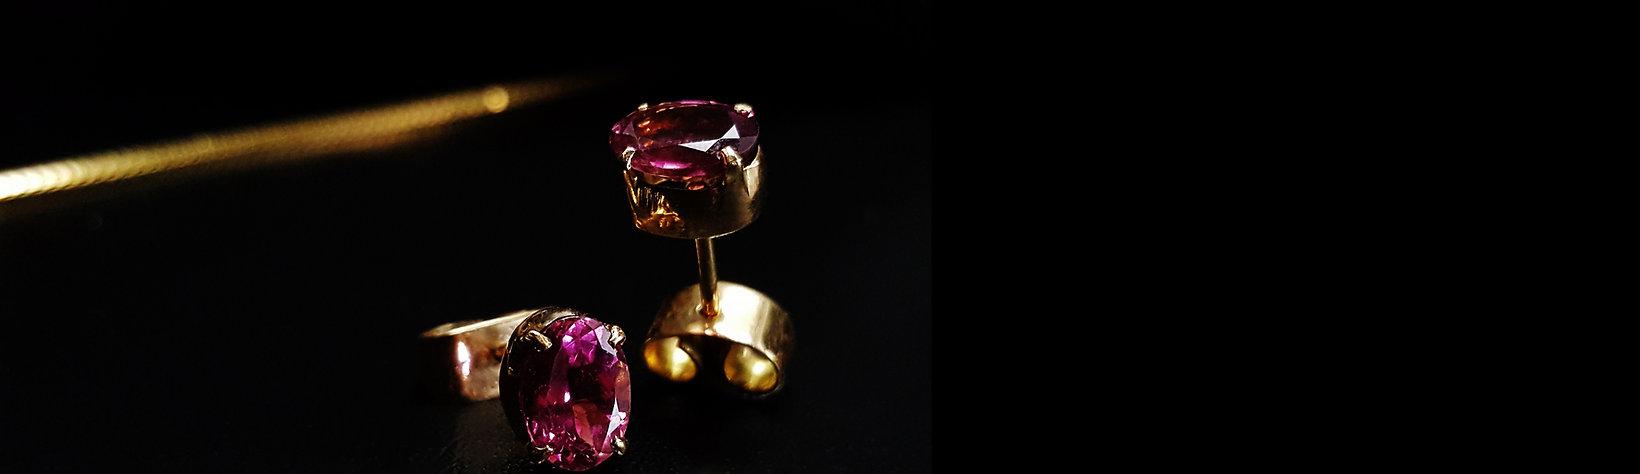 Ohrringe Turmalin, pink Turmalin Ohrringe, 18K gold Ohrringe, Turmalin und 750 Gold, Ohrringe Damen, Gemory Design Erlangen